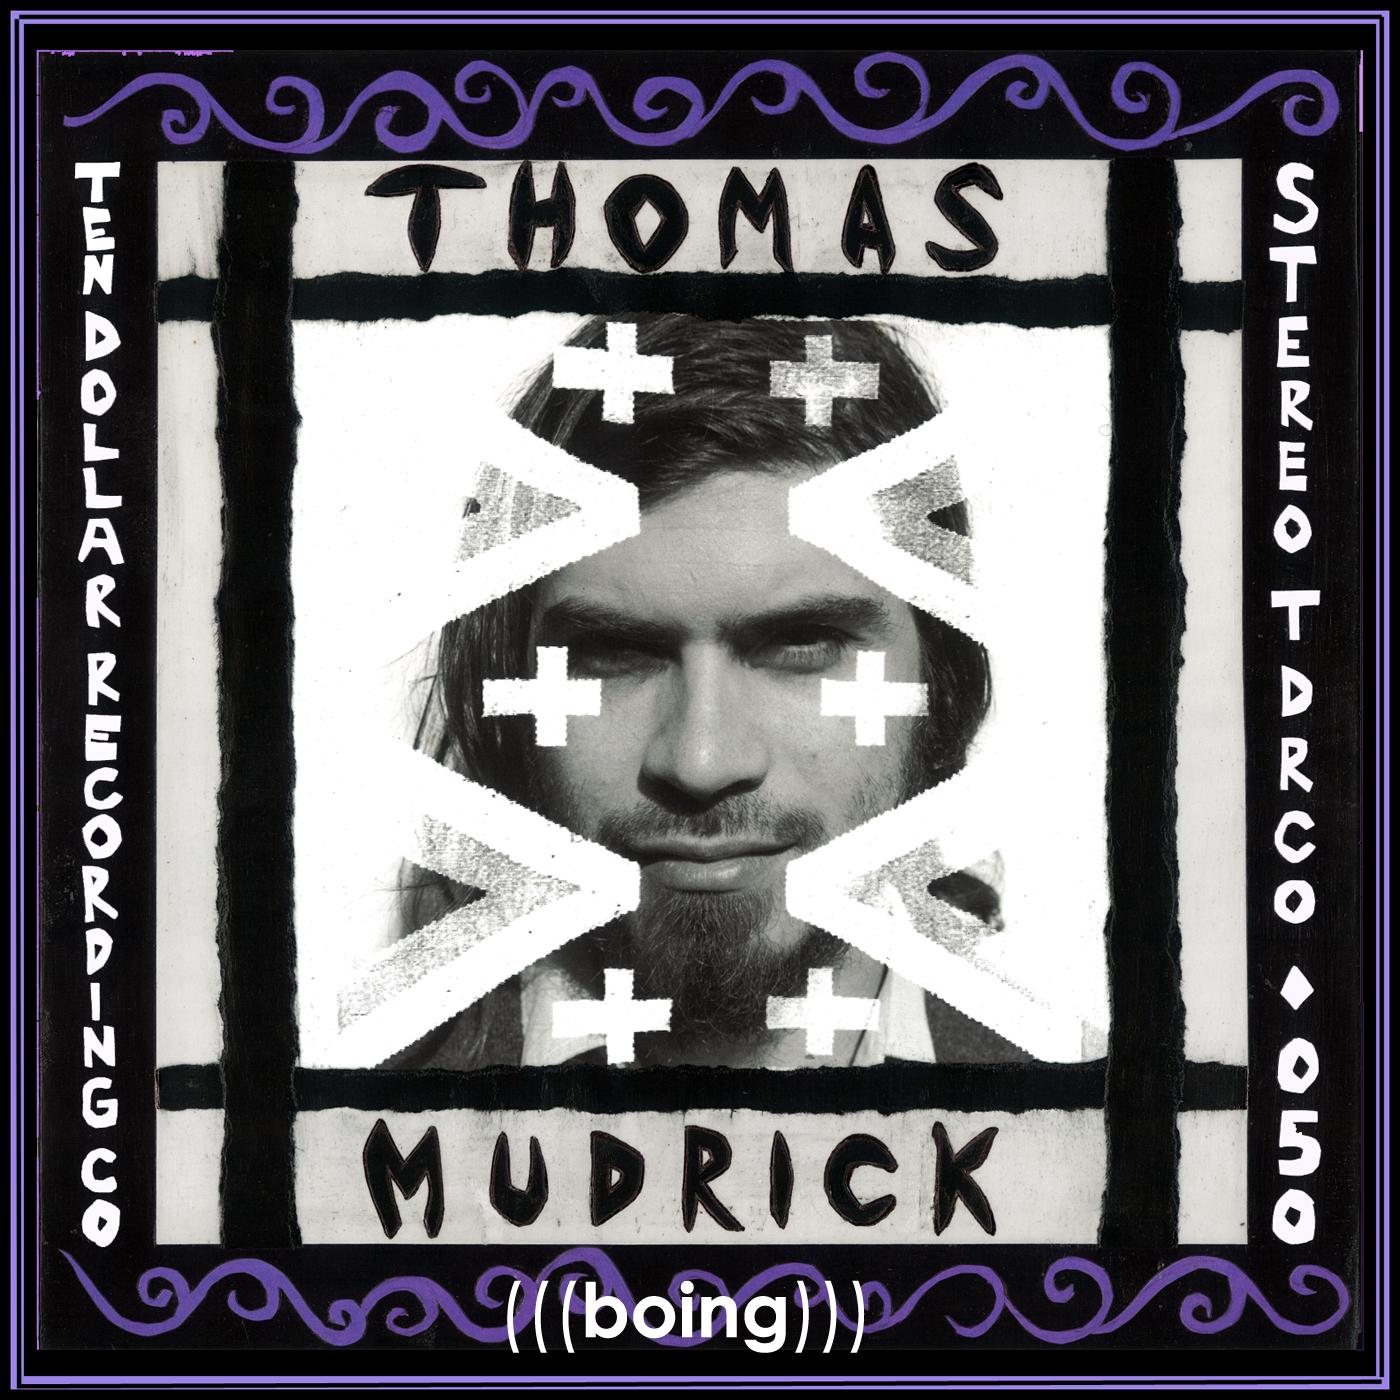 Thomas Mudrick - (((boing)))